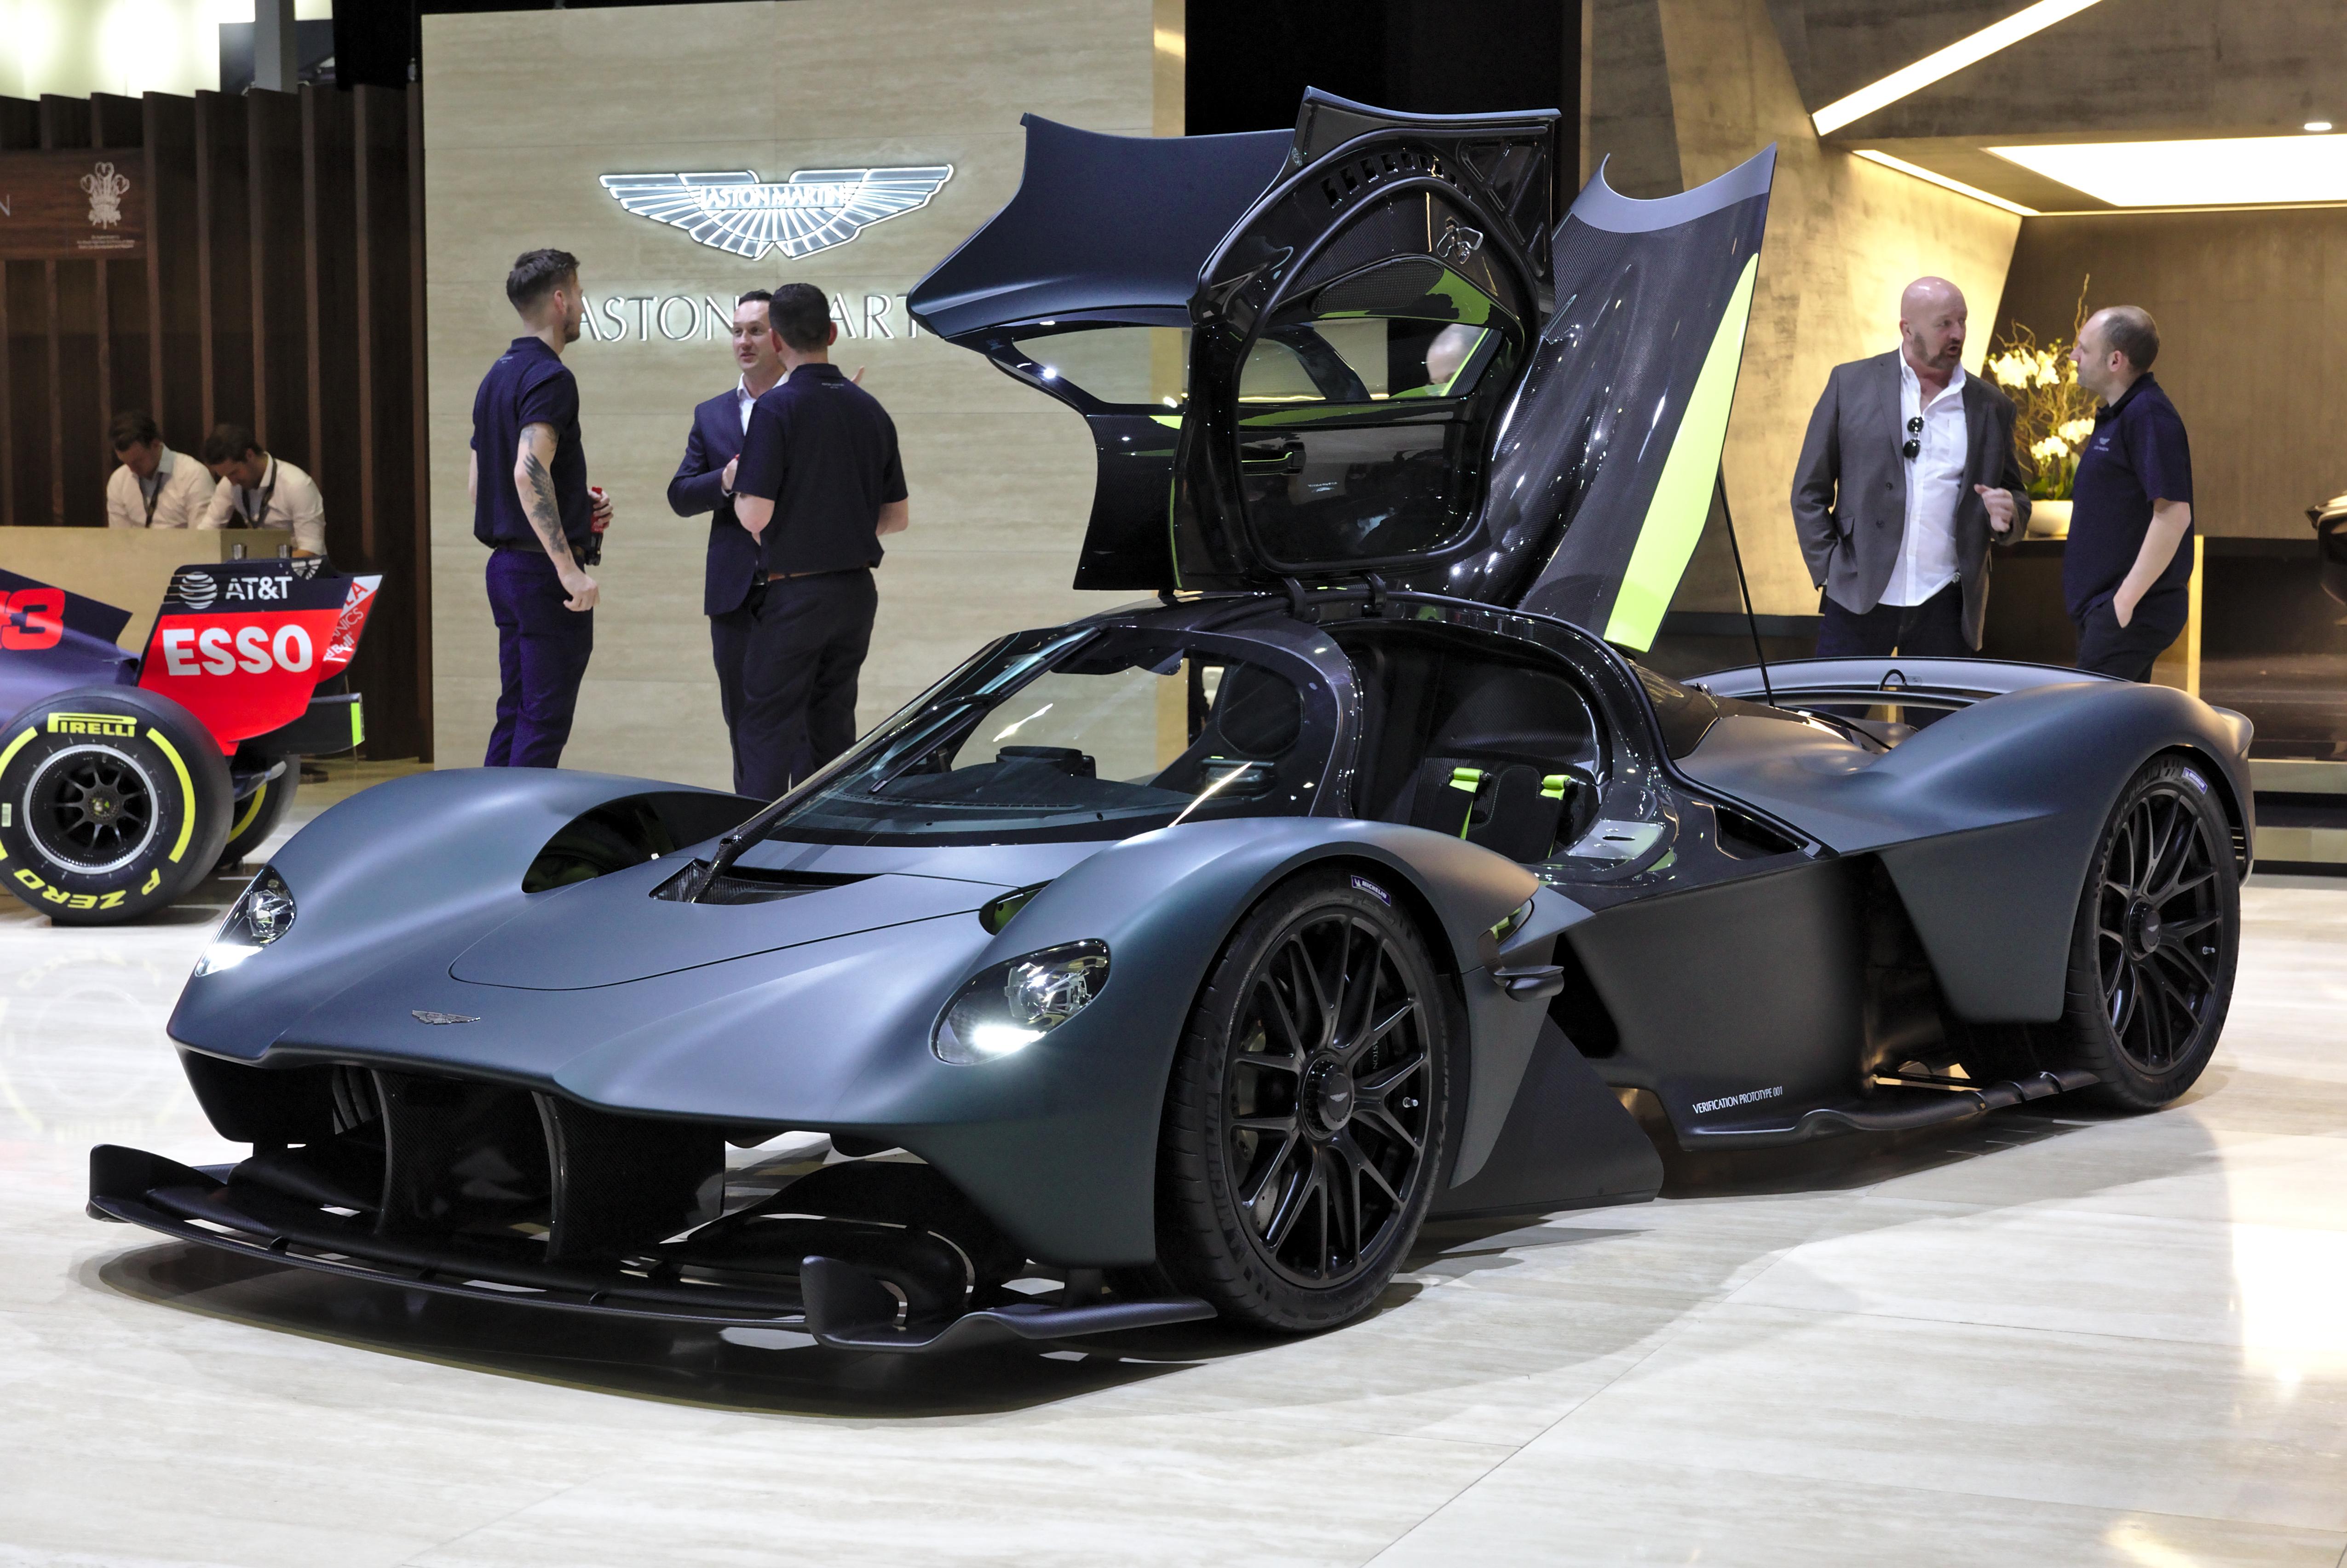 Datei Aston Martin Valkyrie Verification Prototype 001 Genf 2019 1y7a5574 Jpg Wikipedia